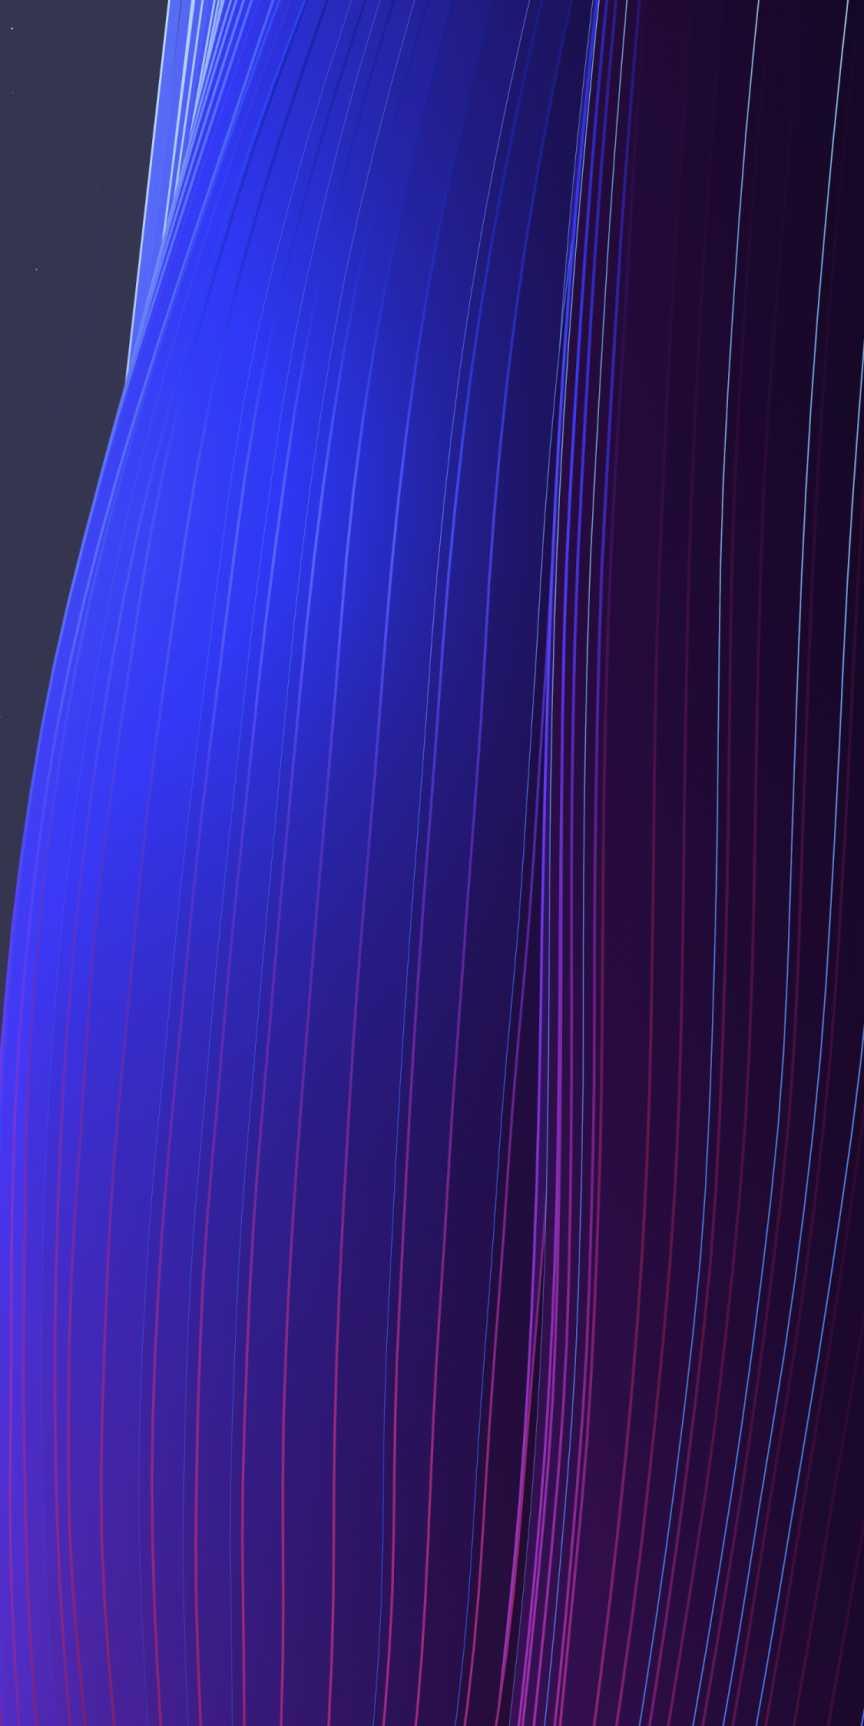 iPhone X10 4k HD Wallpapers - Wallpaper Cave